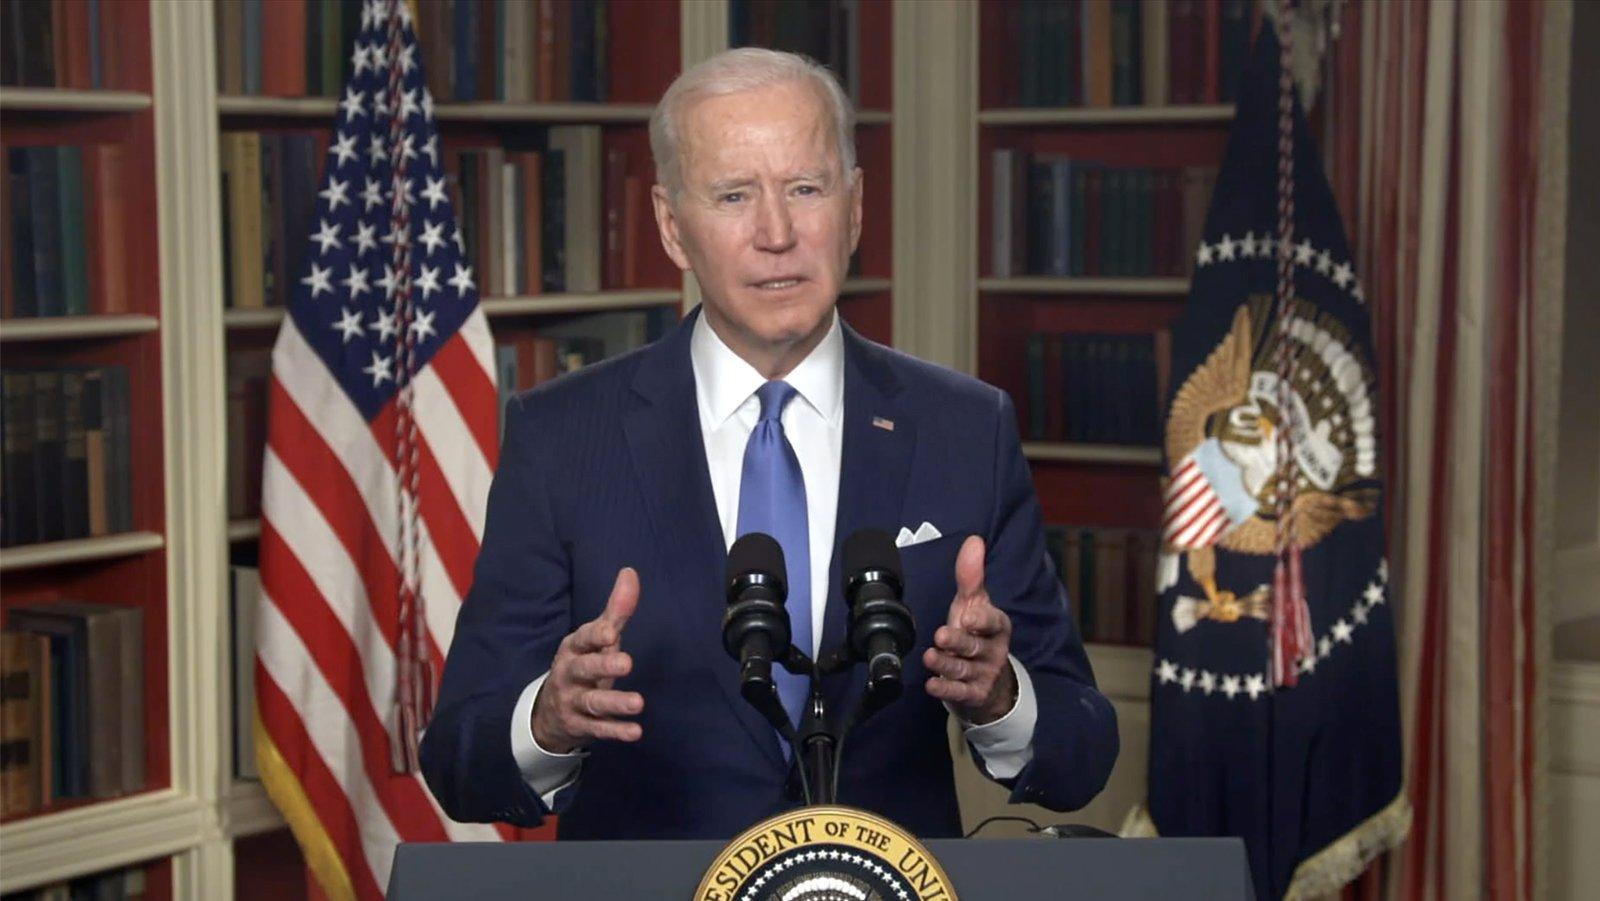 President Joe Biden addresses the the 2021 National Prayer Breakfast. Video screengrab